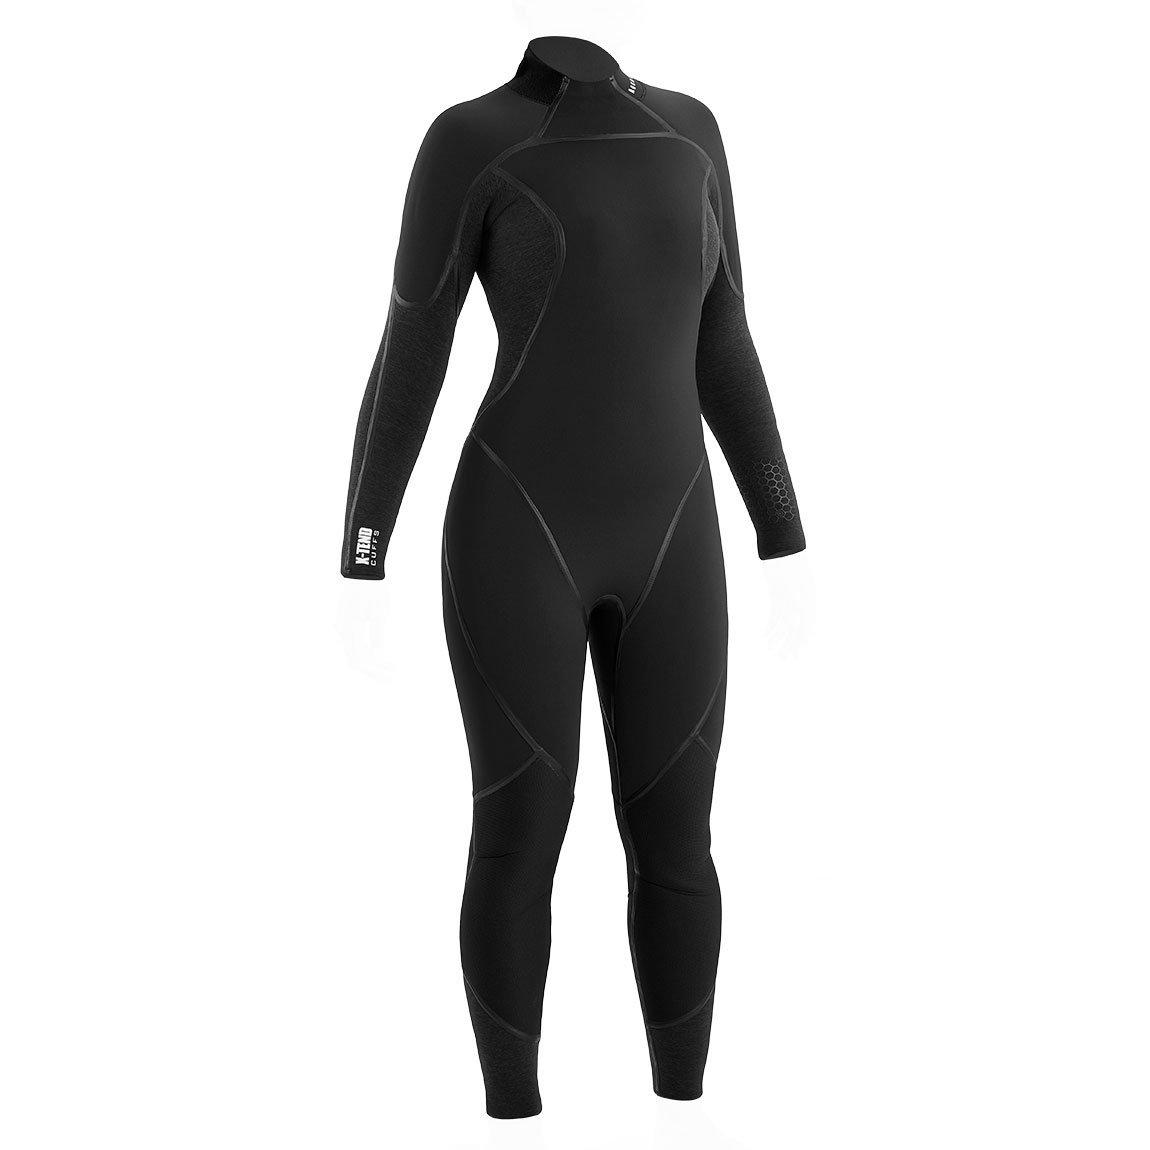 Wetsuit 3mm Aquaflex Women's Black/Charcoal